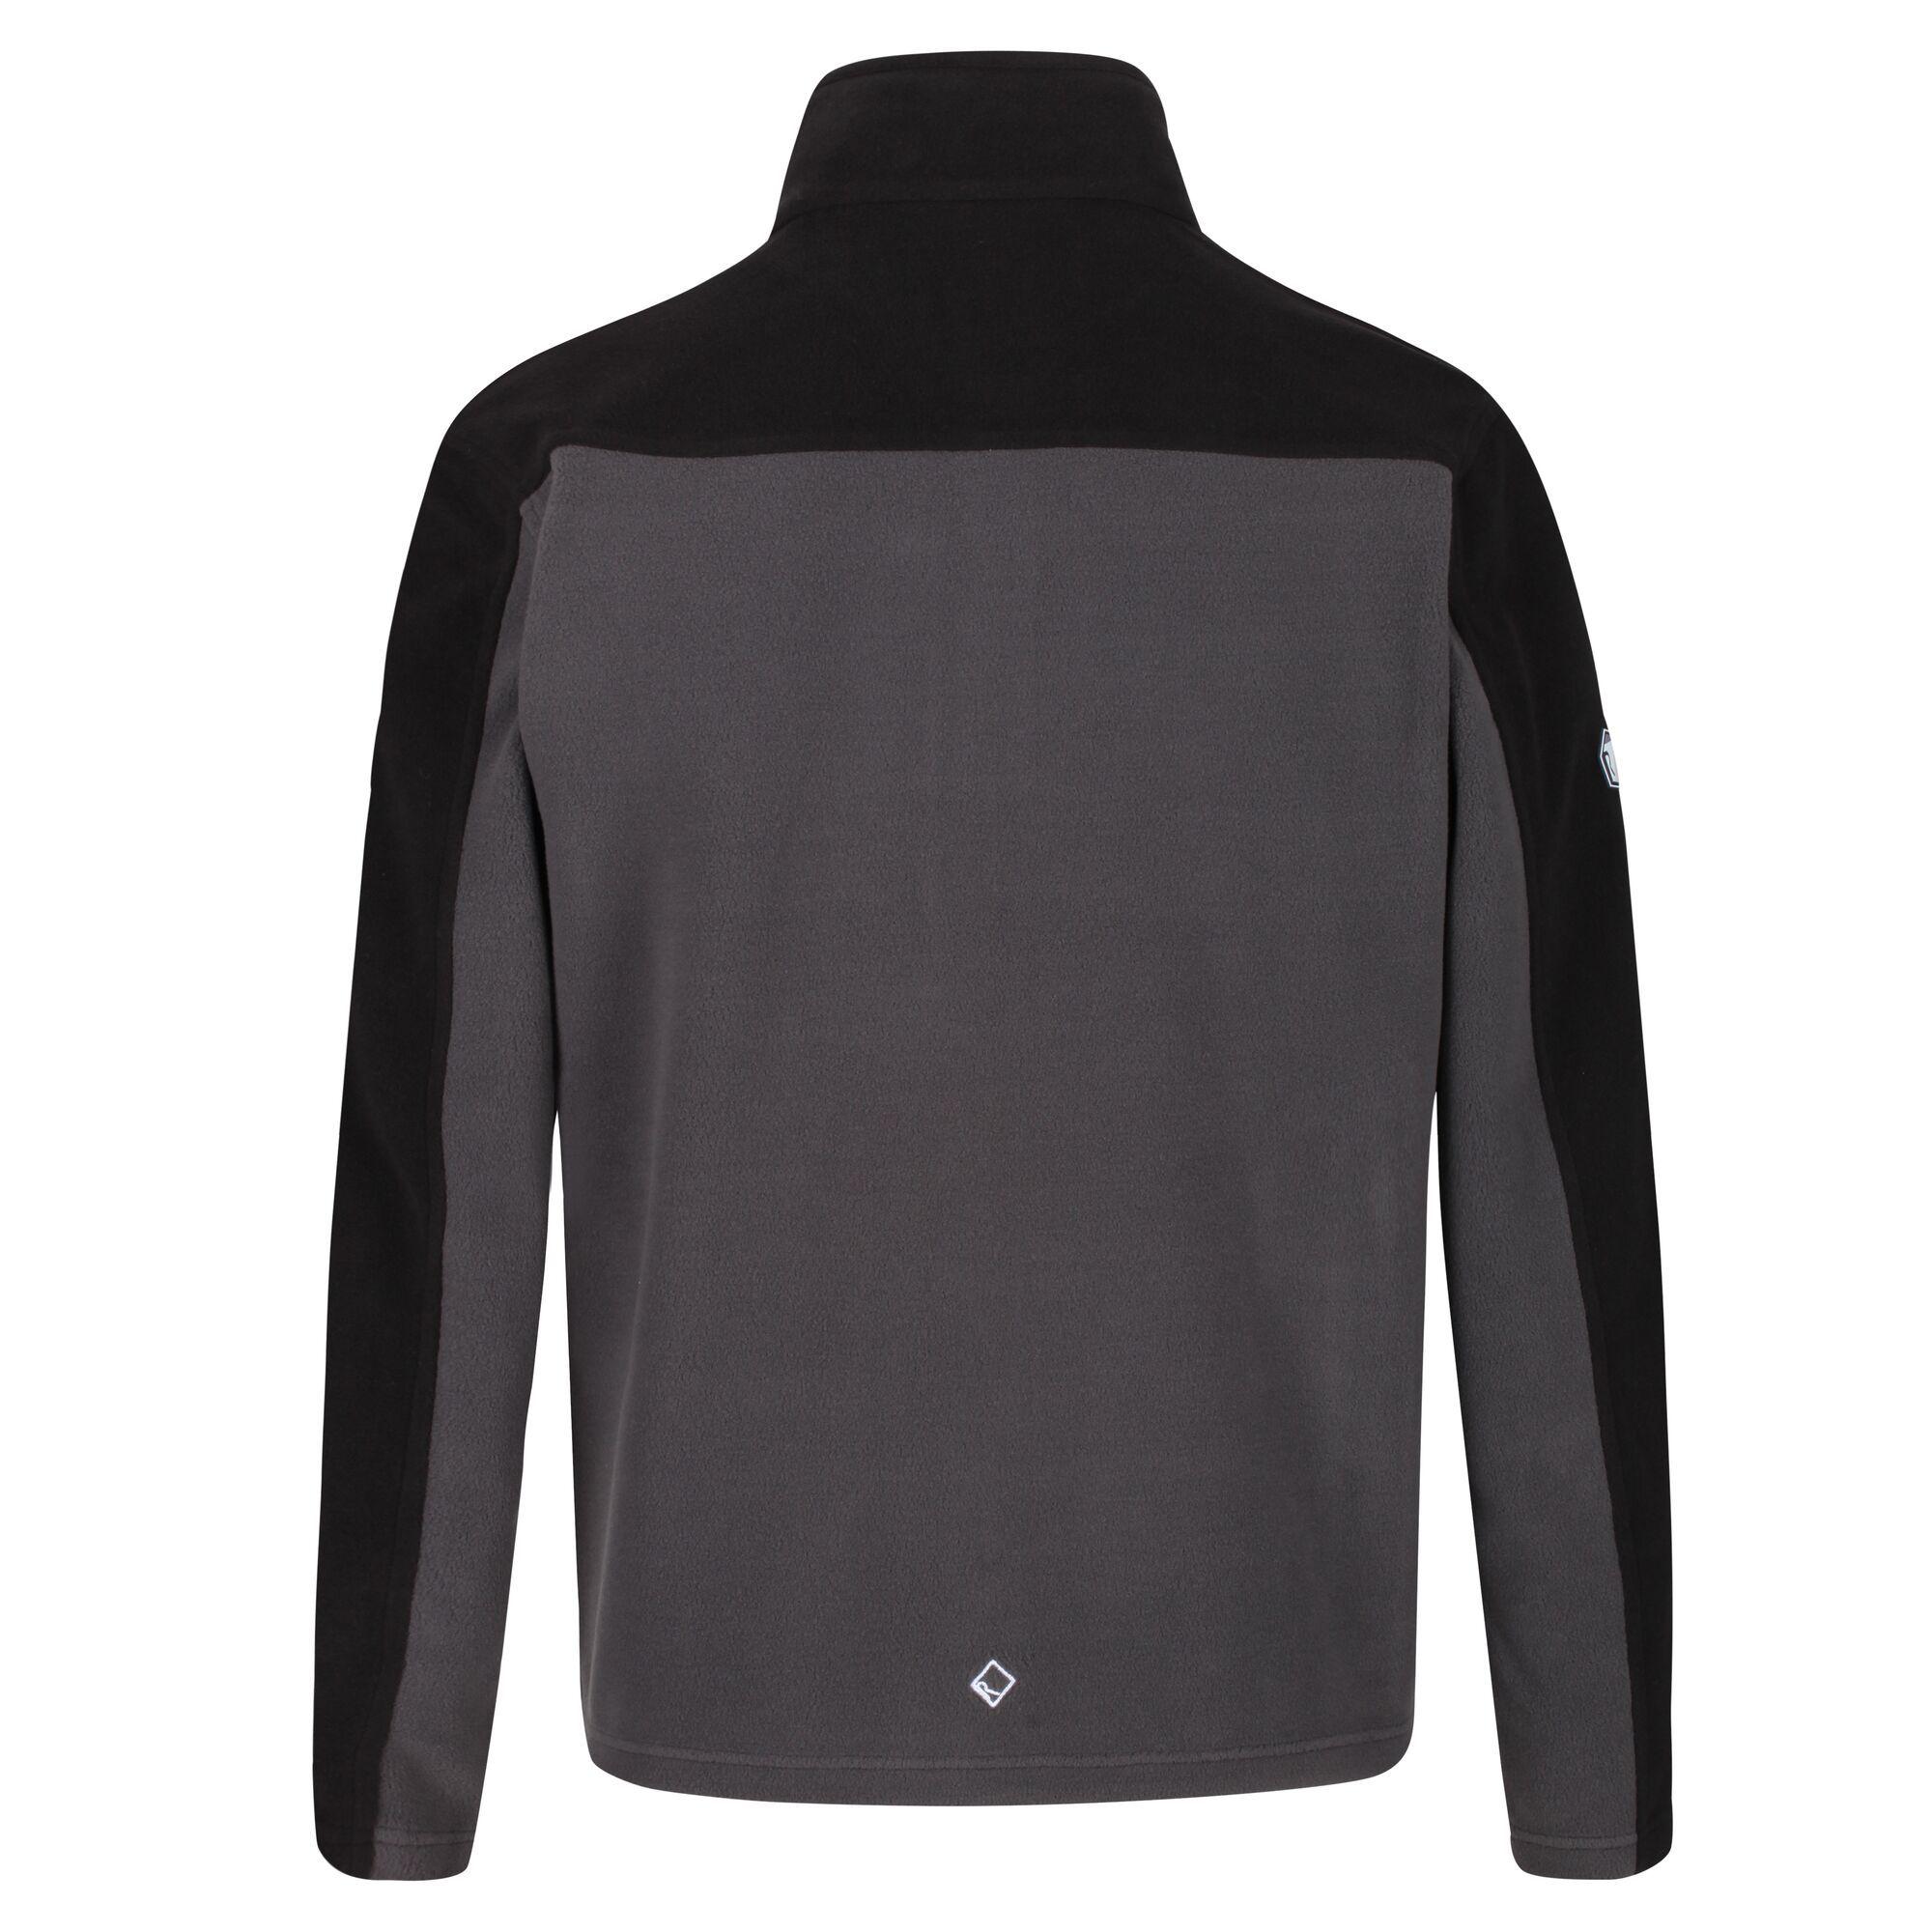 thumbnail 9 - Regatta Fellard Mens Lightweight Full Zip Warm Walking Fleece Jacket RRP £30